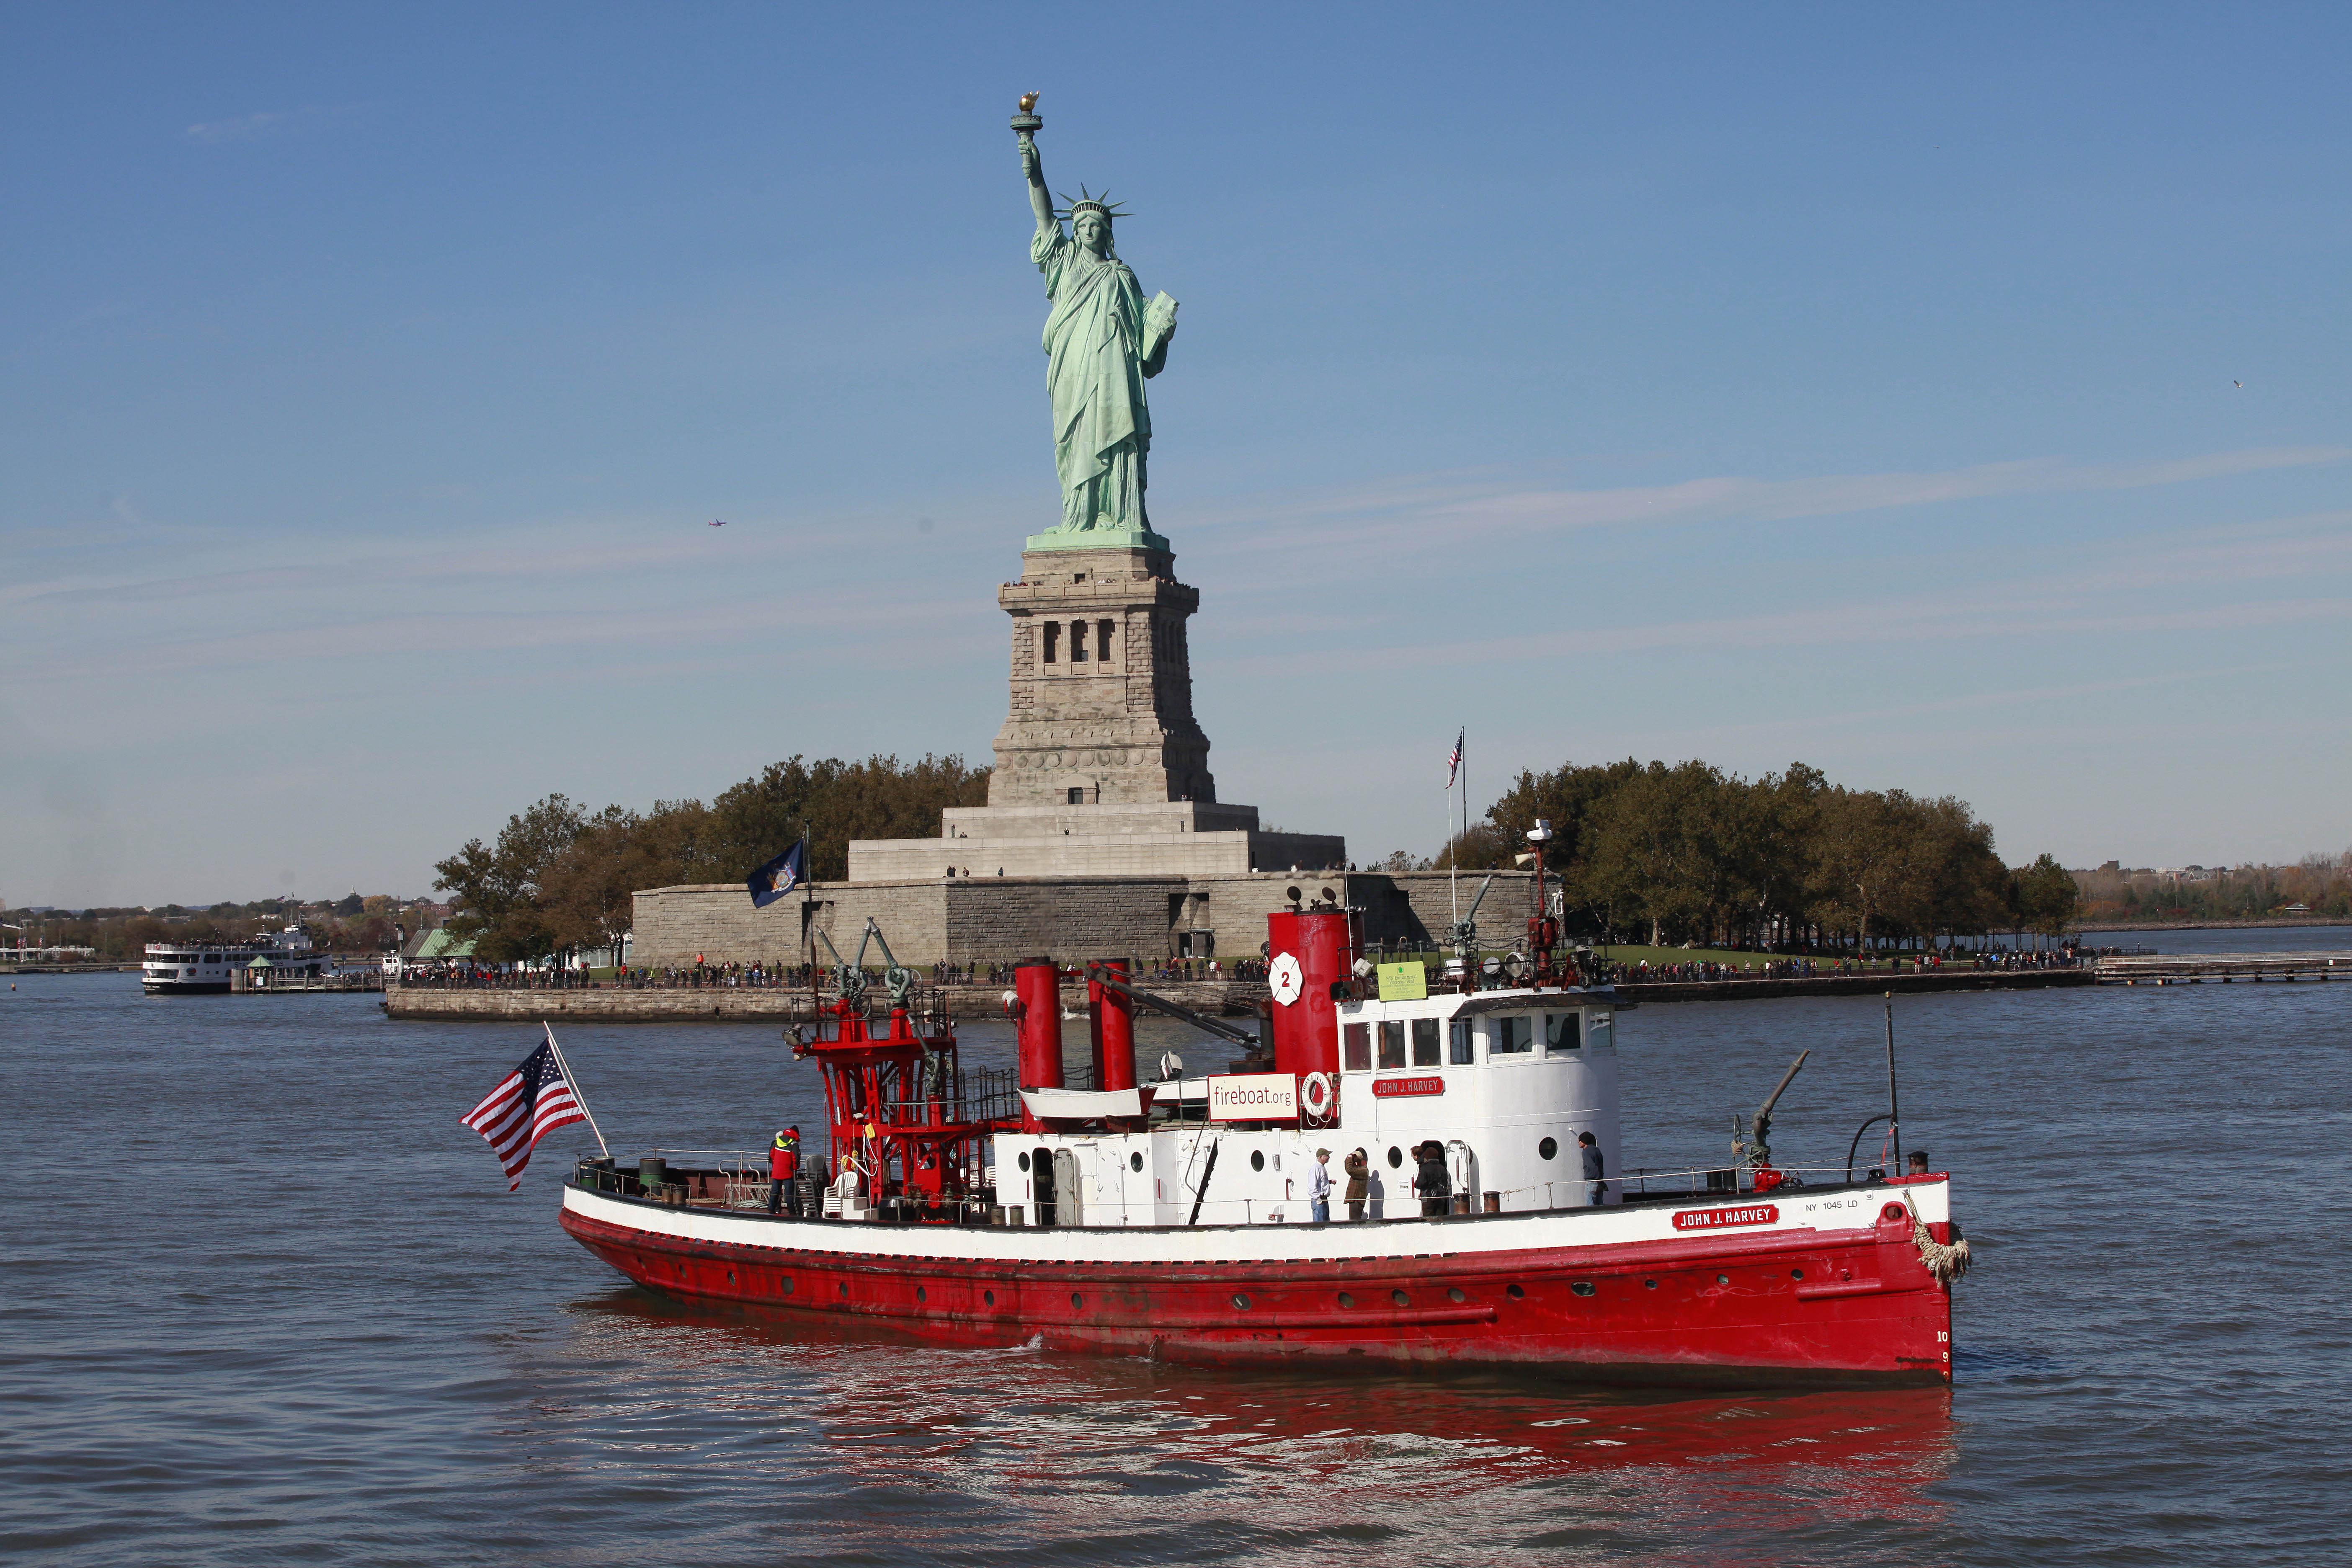 The fireboat John J. Harvey passes the Statue of Liberty on Friday, Oct. 28, 2011, in New York Harbor.